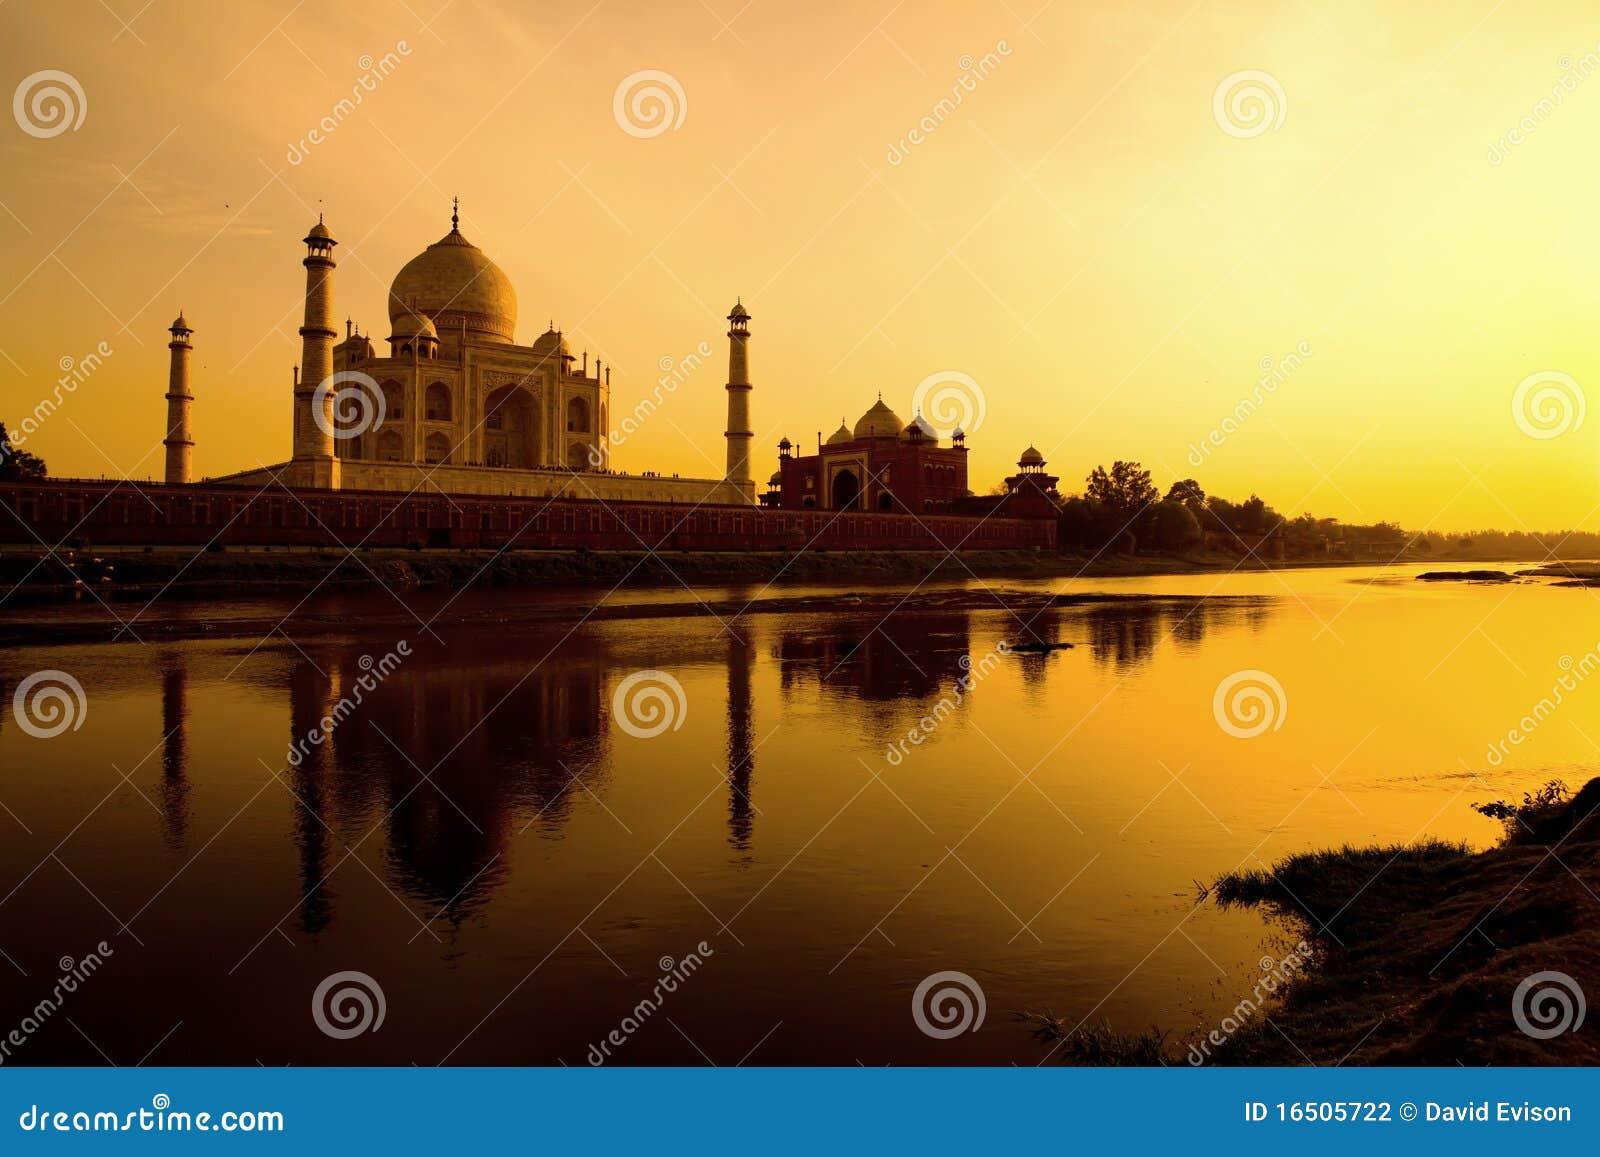 Taj Mahal at sunset.